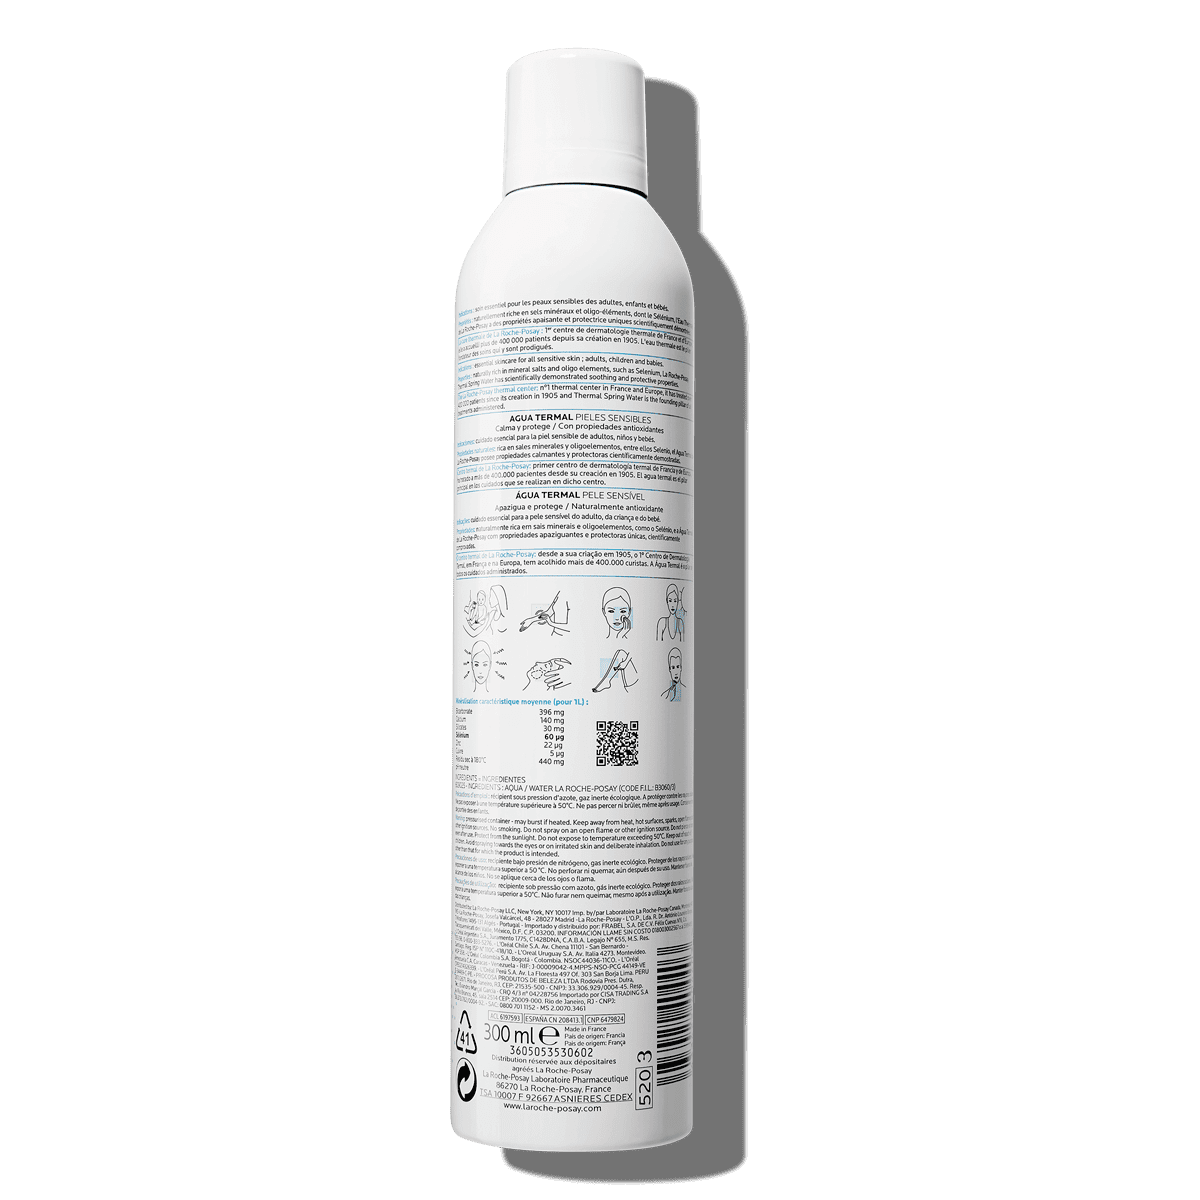 La Roche Posay ProduktSide Termalsk kildevann 300ml 3433422404403 Ba